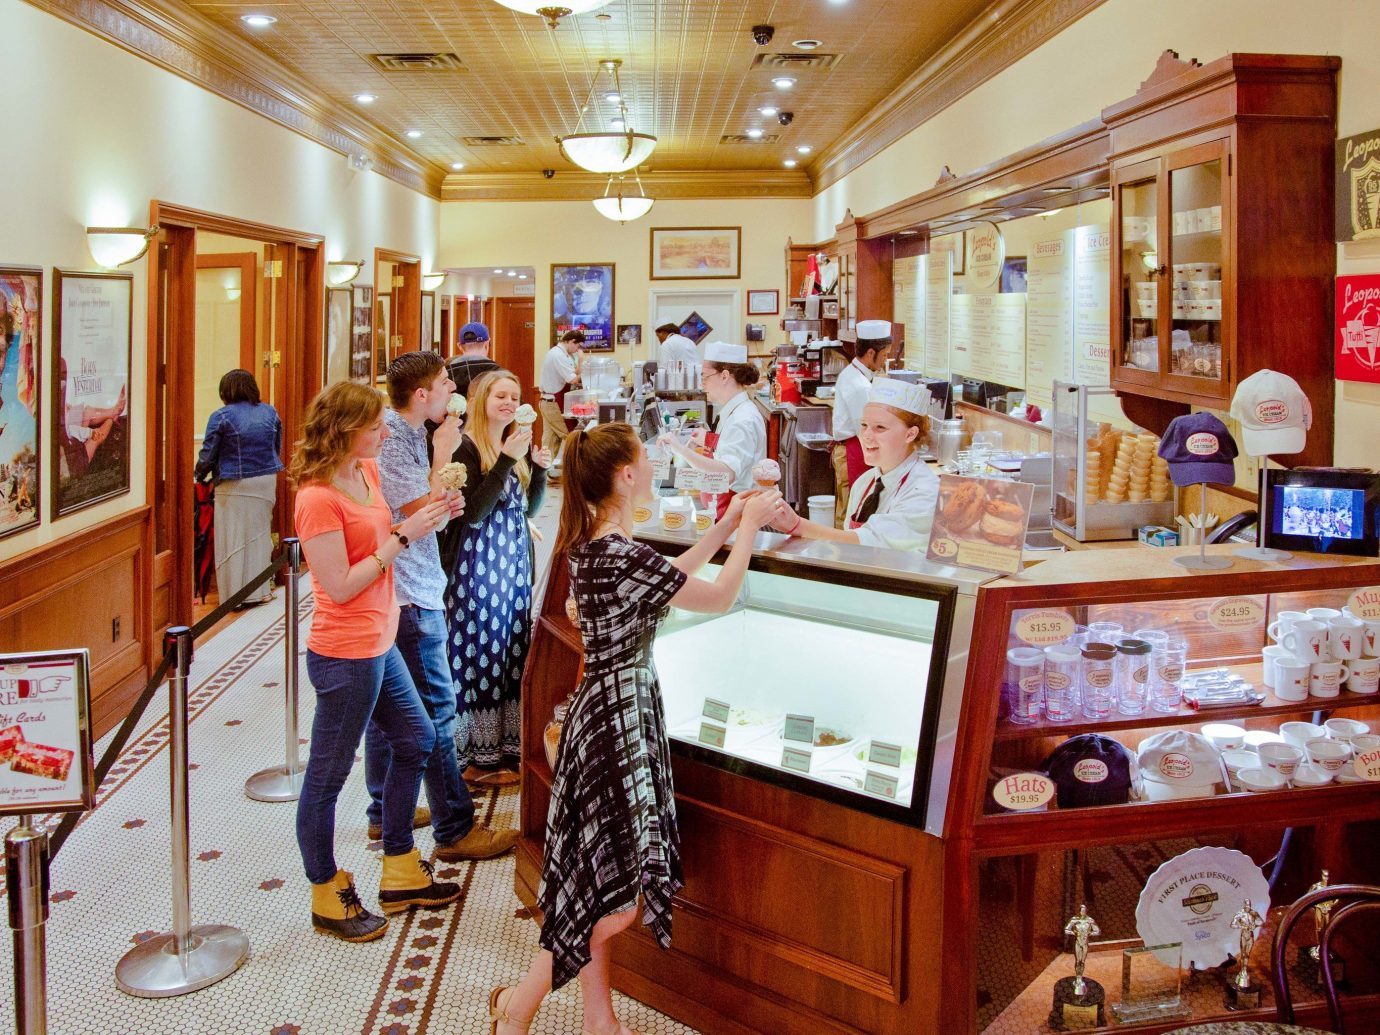 Girls Getaways Trip Ideas Weekend Getaways indoor ceiling person retail interior design shopping